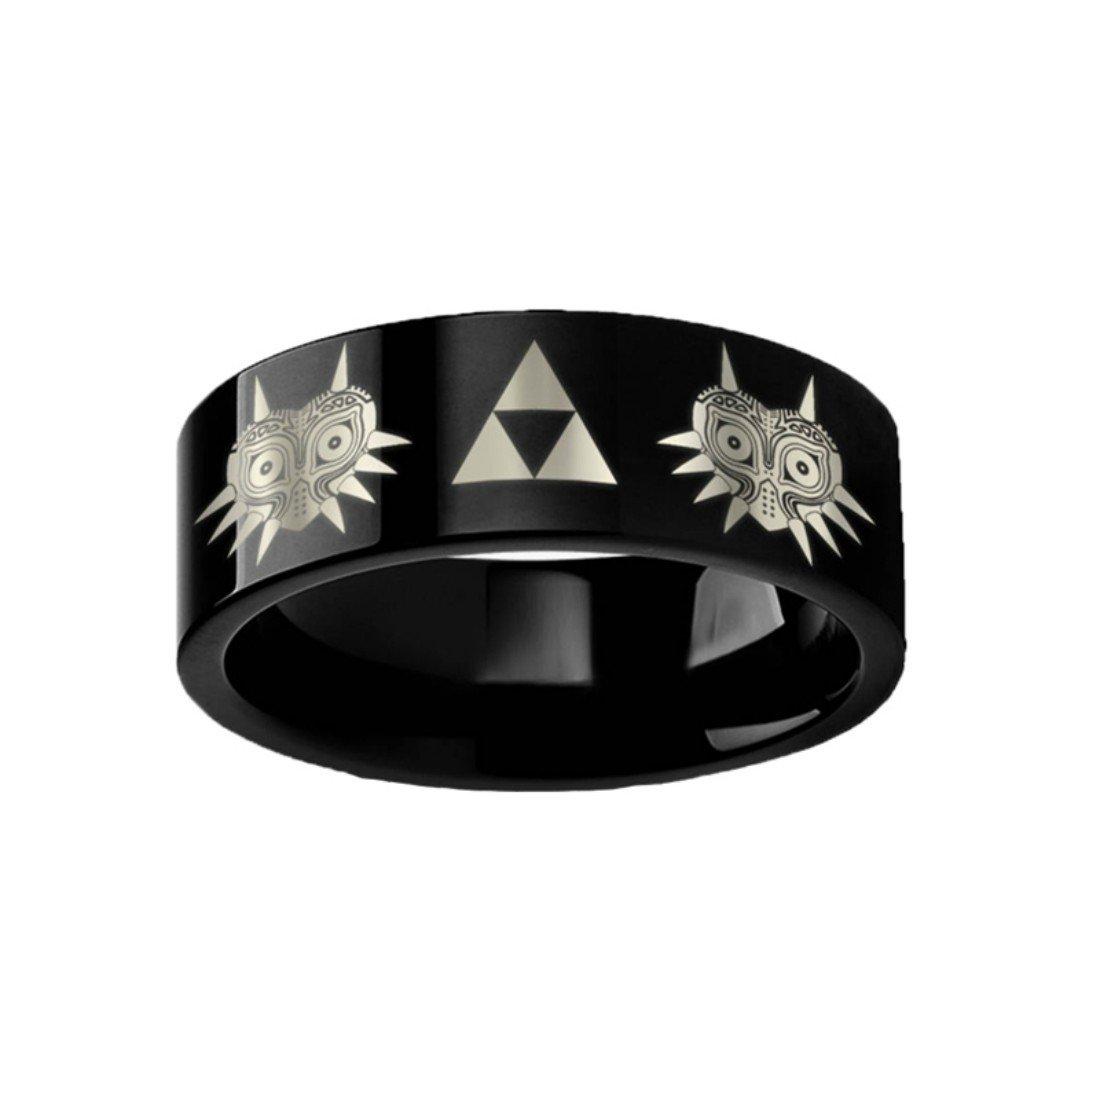 Thorsten Legend of Zelda Majora Mask Triforce Black Tungsten 8mm Wide Ring Wedding Band from Roy Rose Jewelry